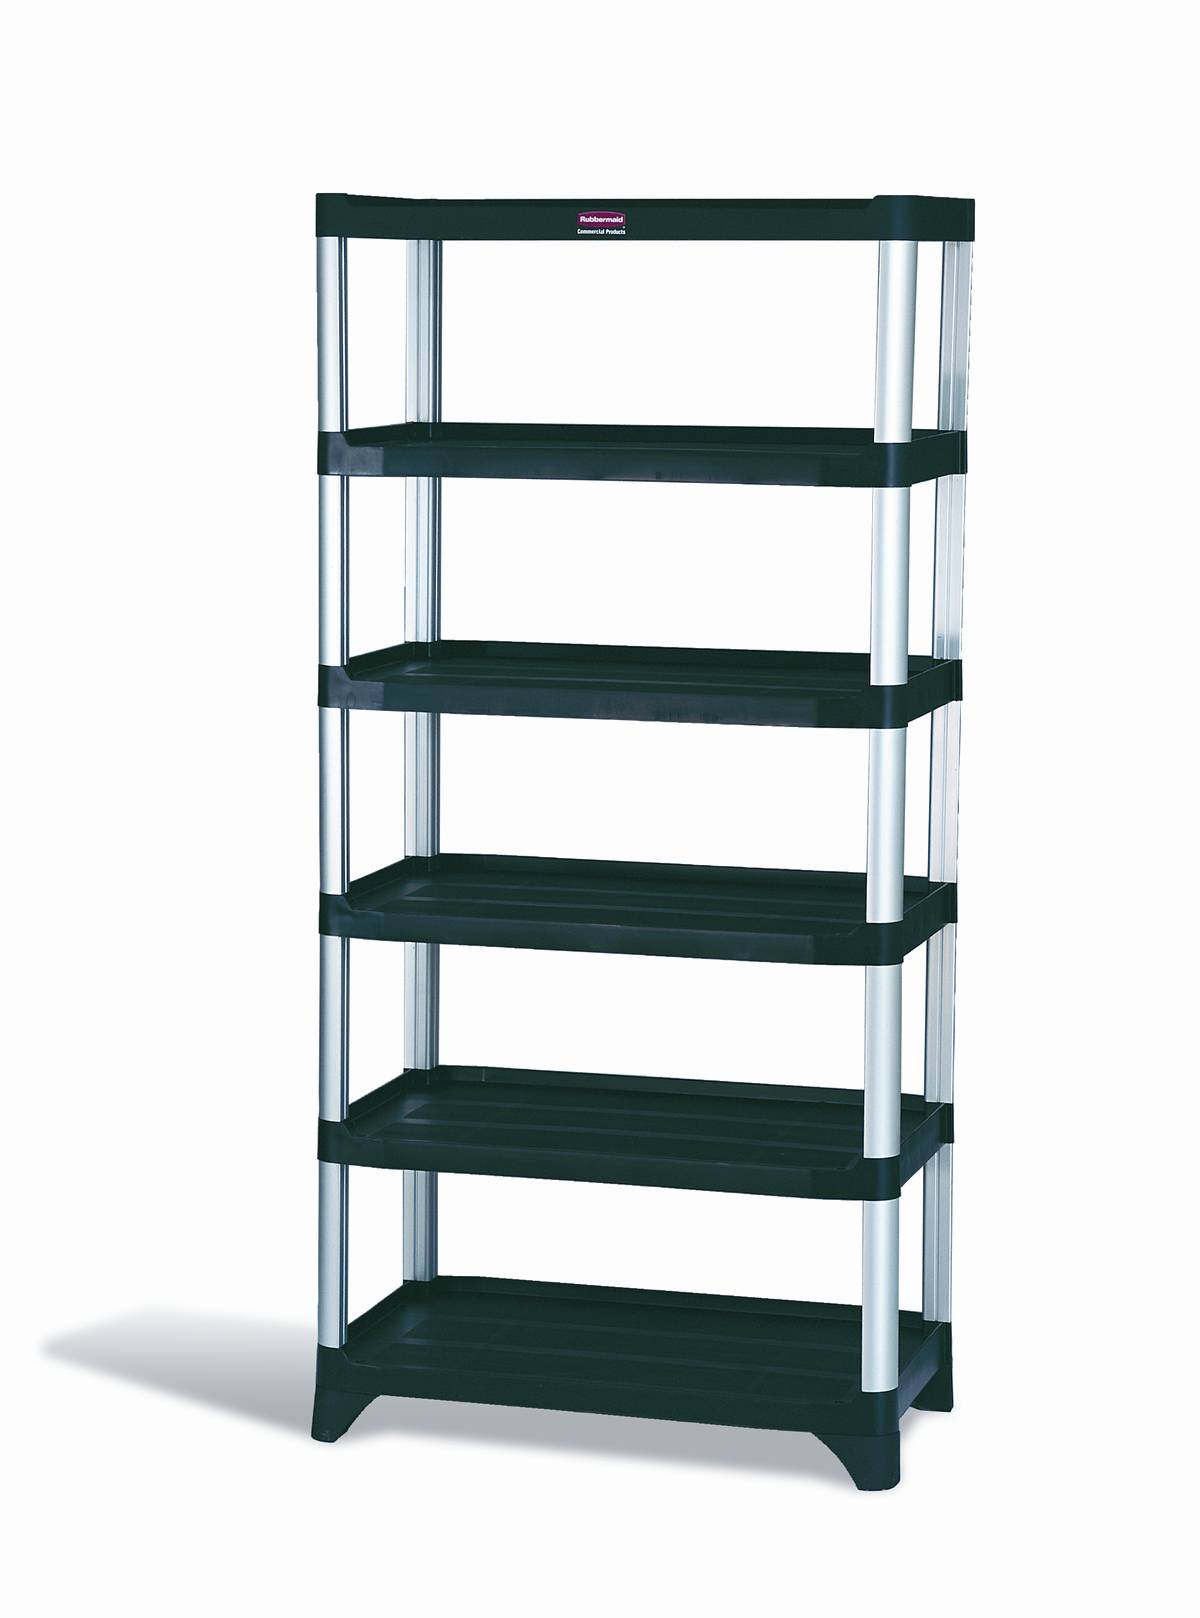 Rubbermaid 9t40 Storage Shelving 6 Shelf Unit